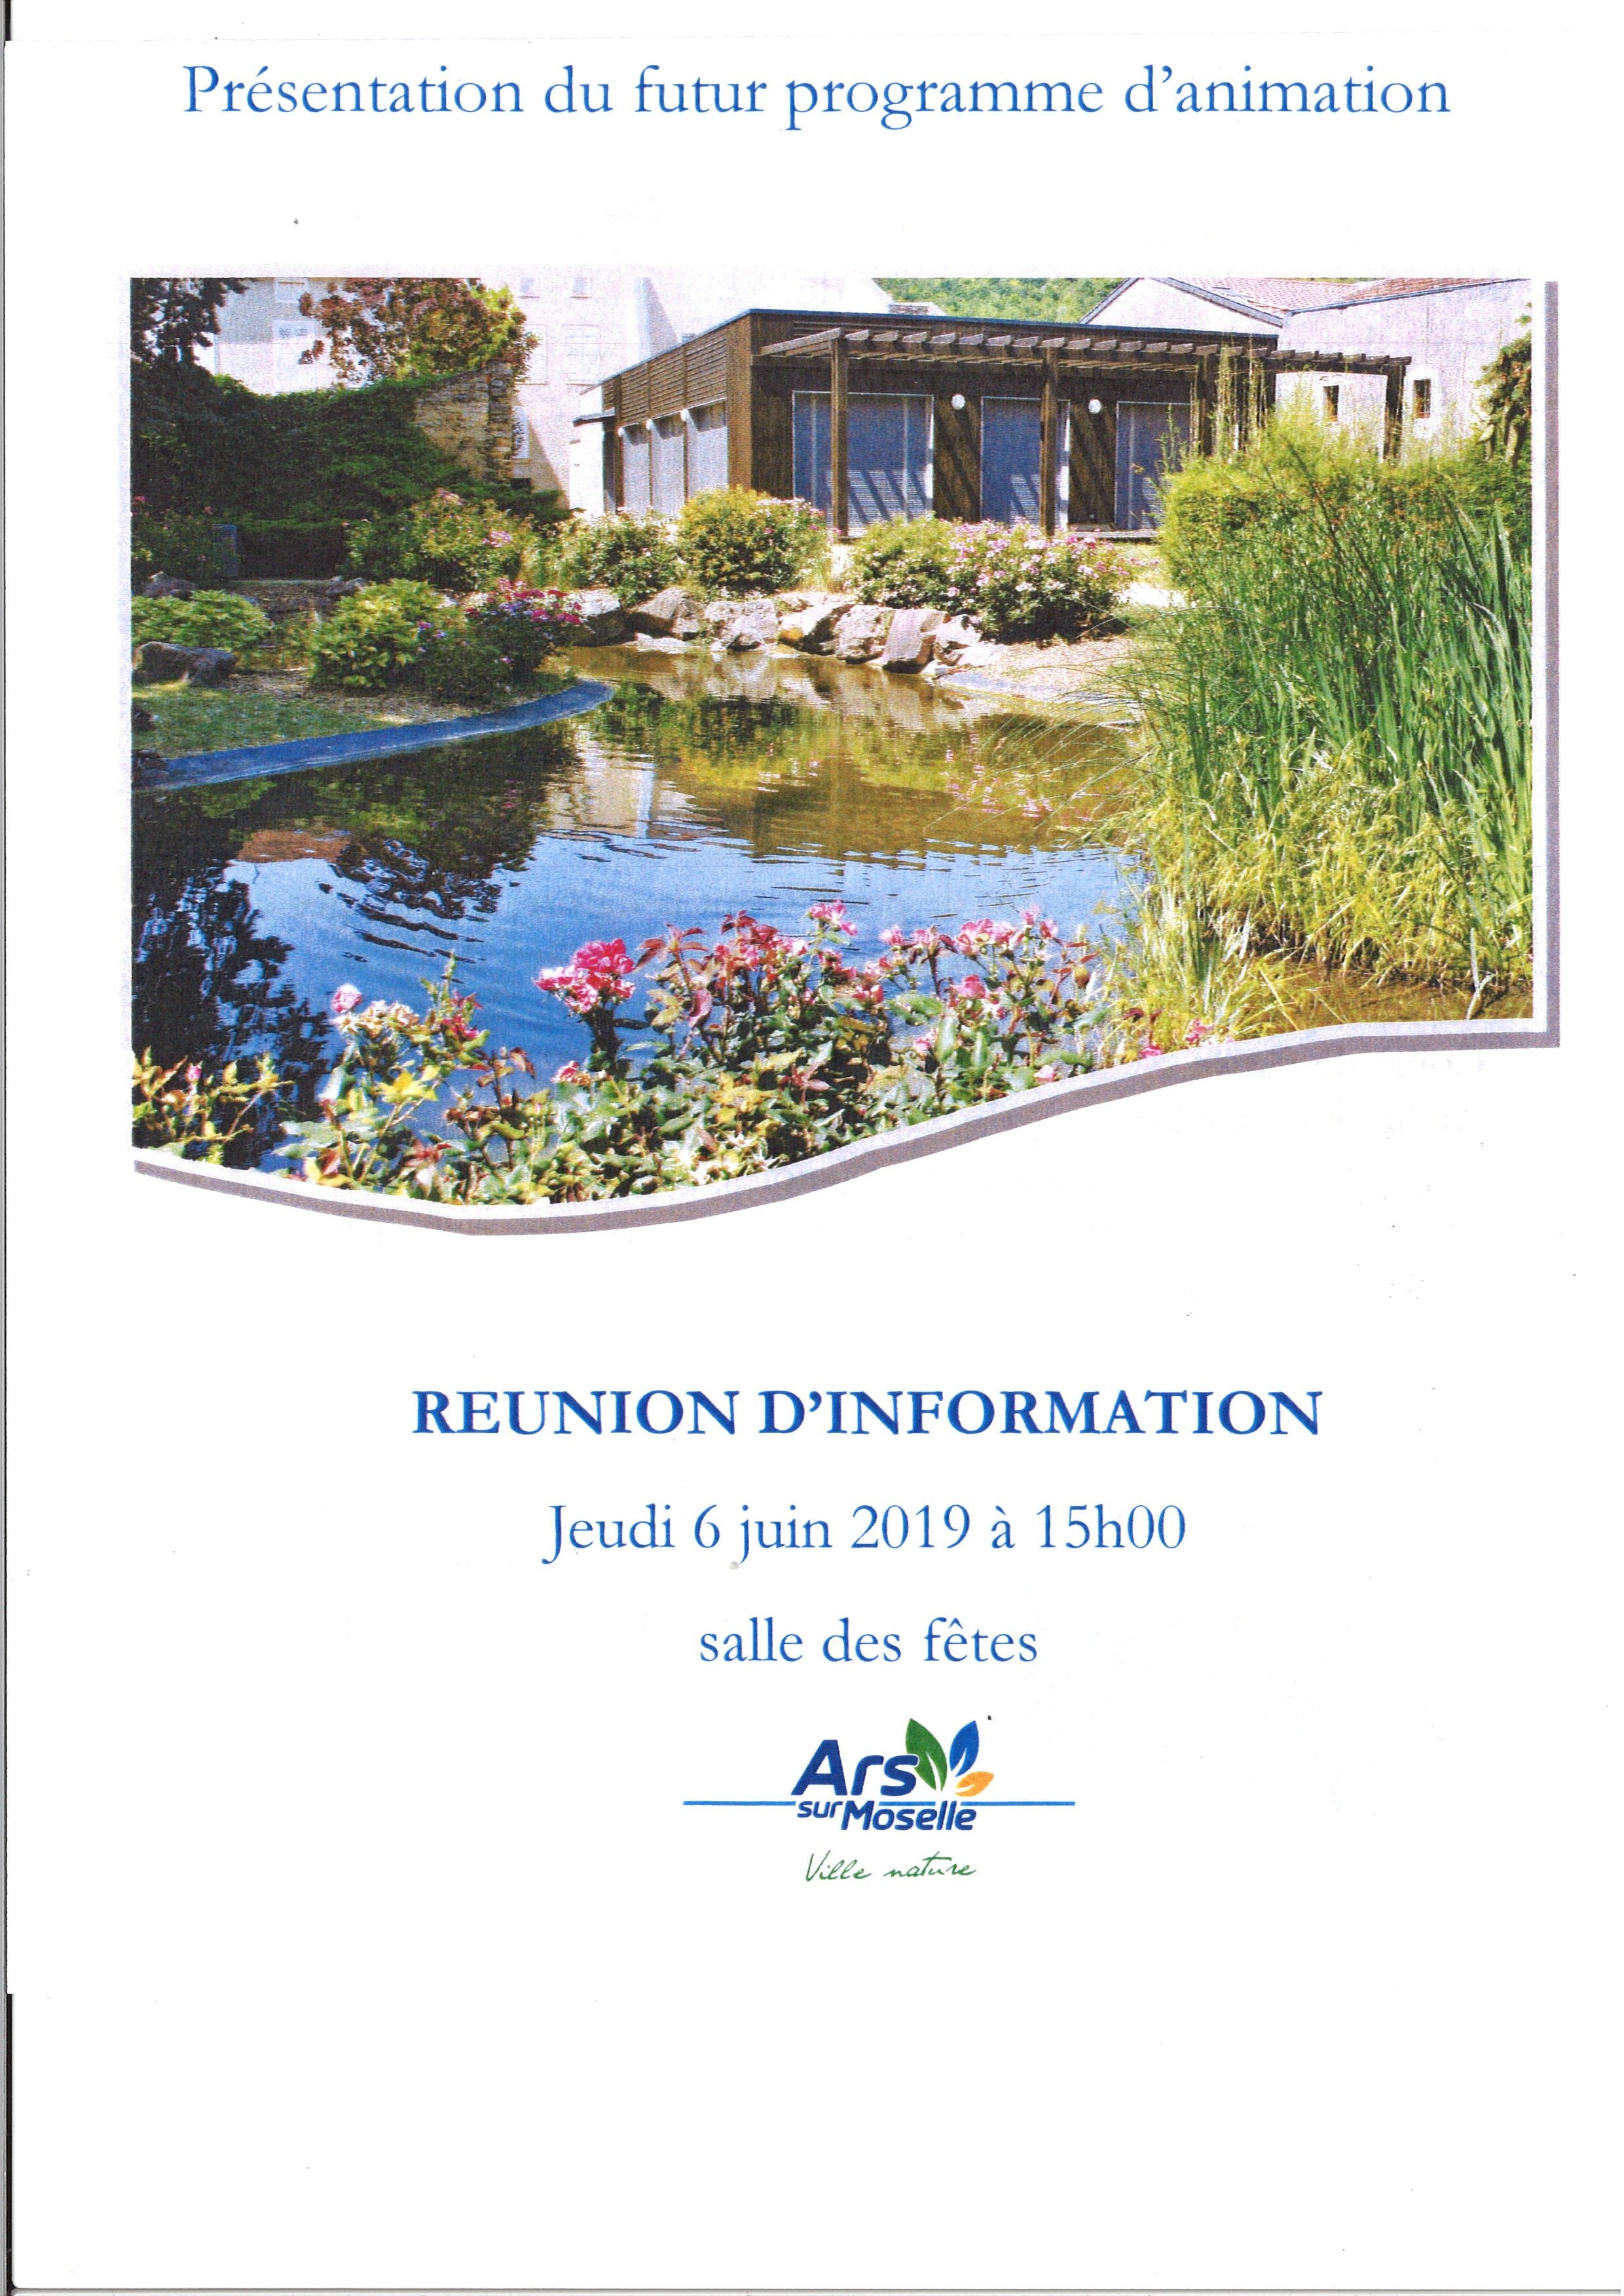 REUNION D'INFORMATION PROJET SENIORS jeudi 6 juin